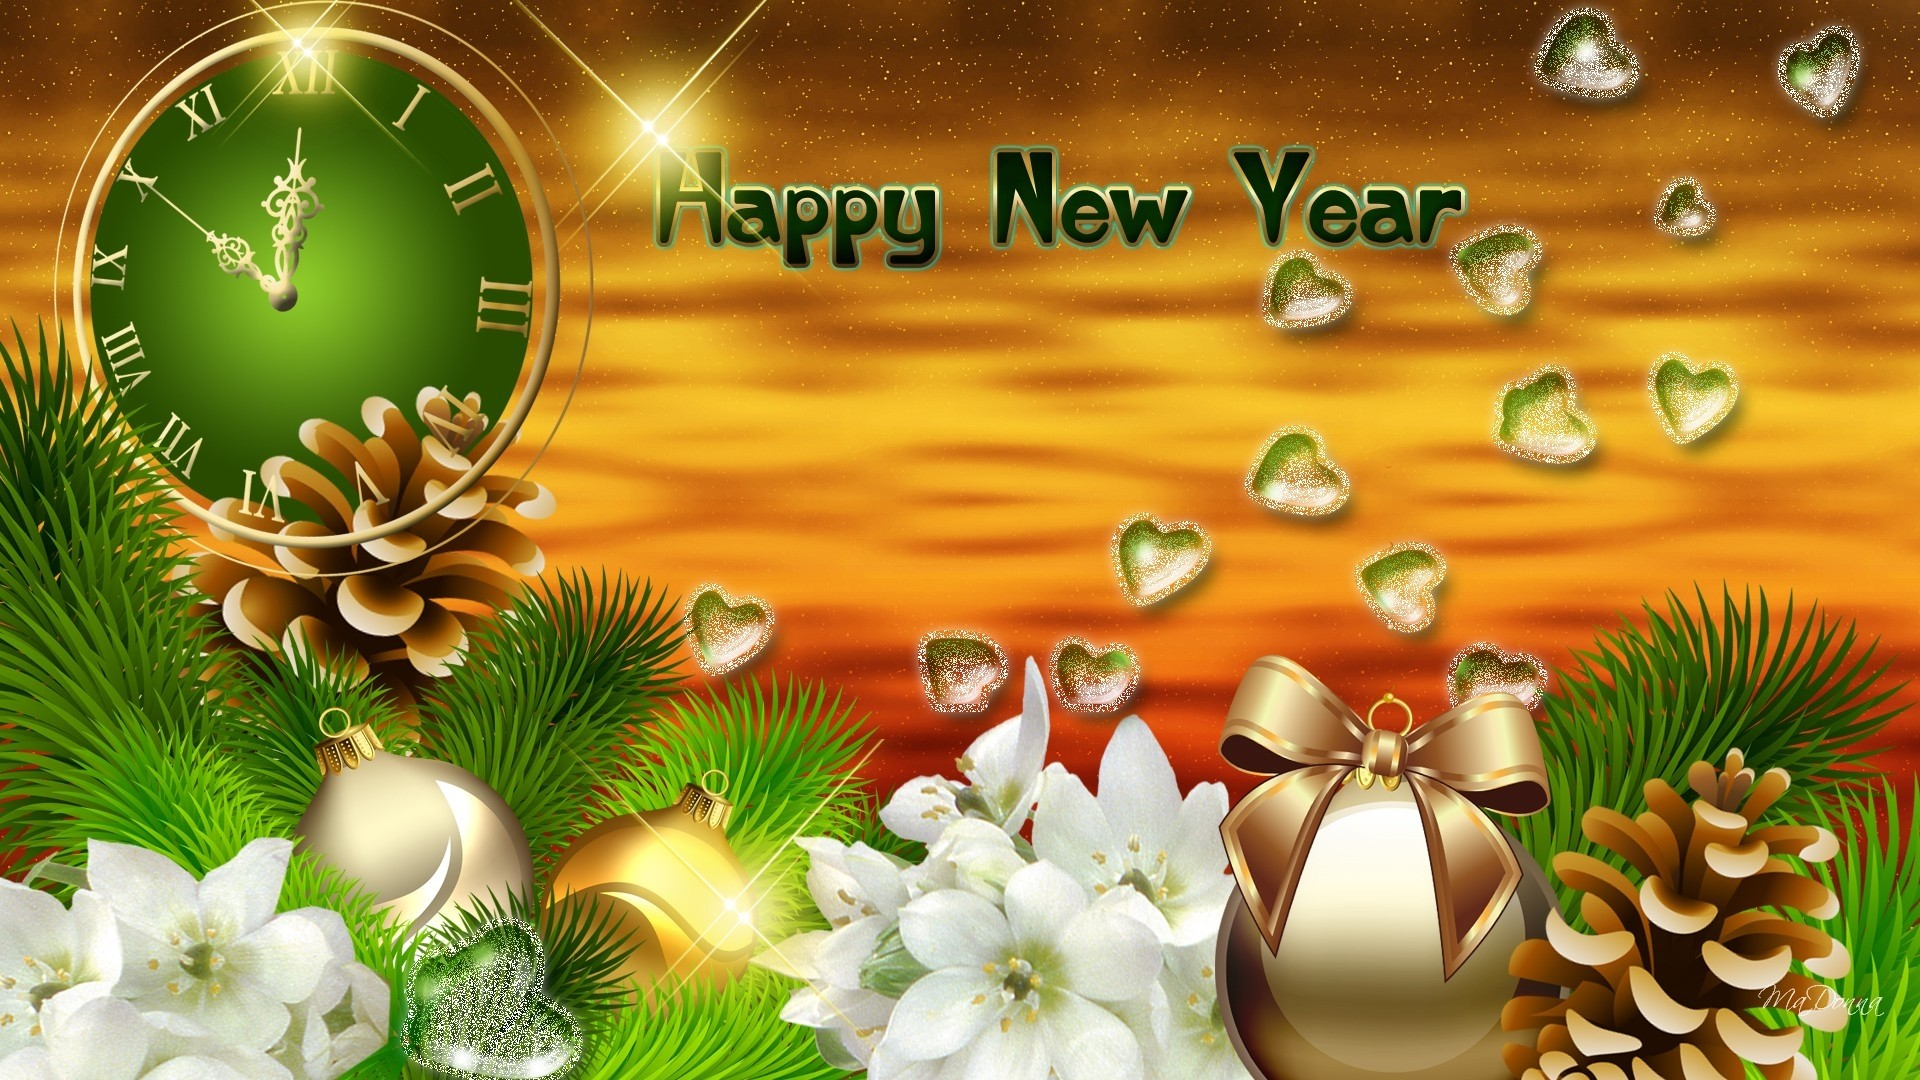 Happy New Year 2014 HD Wallpaper – New Year Widescreen HD .